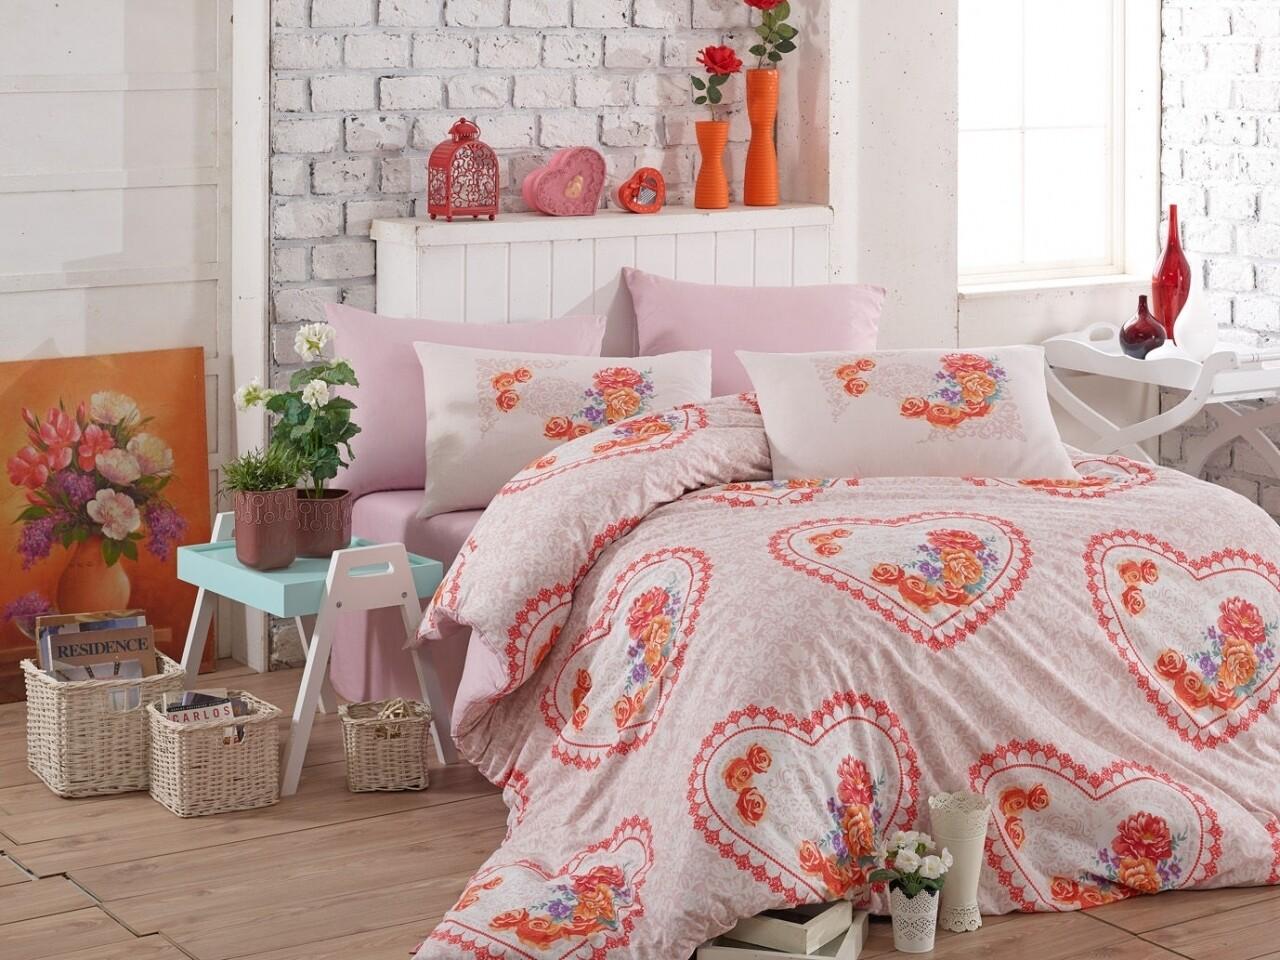 Lenjerie de pat pentru o persoana, 3 piese, 100% bumbac ranforce, Hobby, Lovely, roz